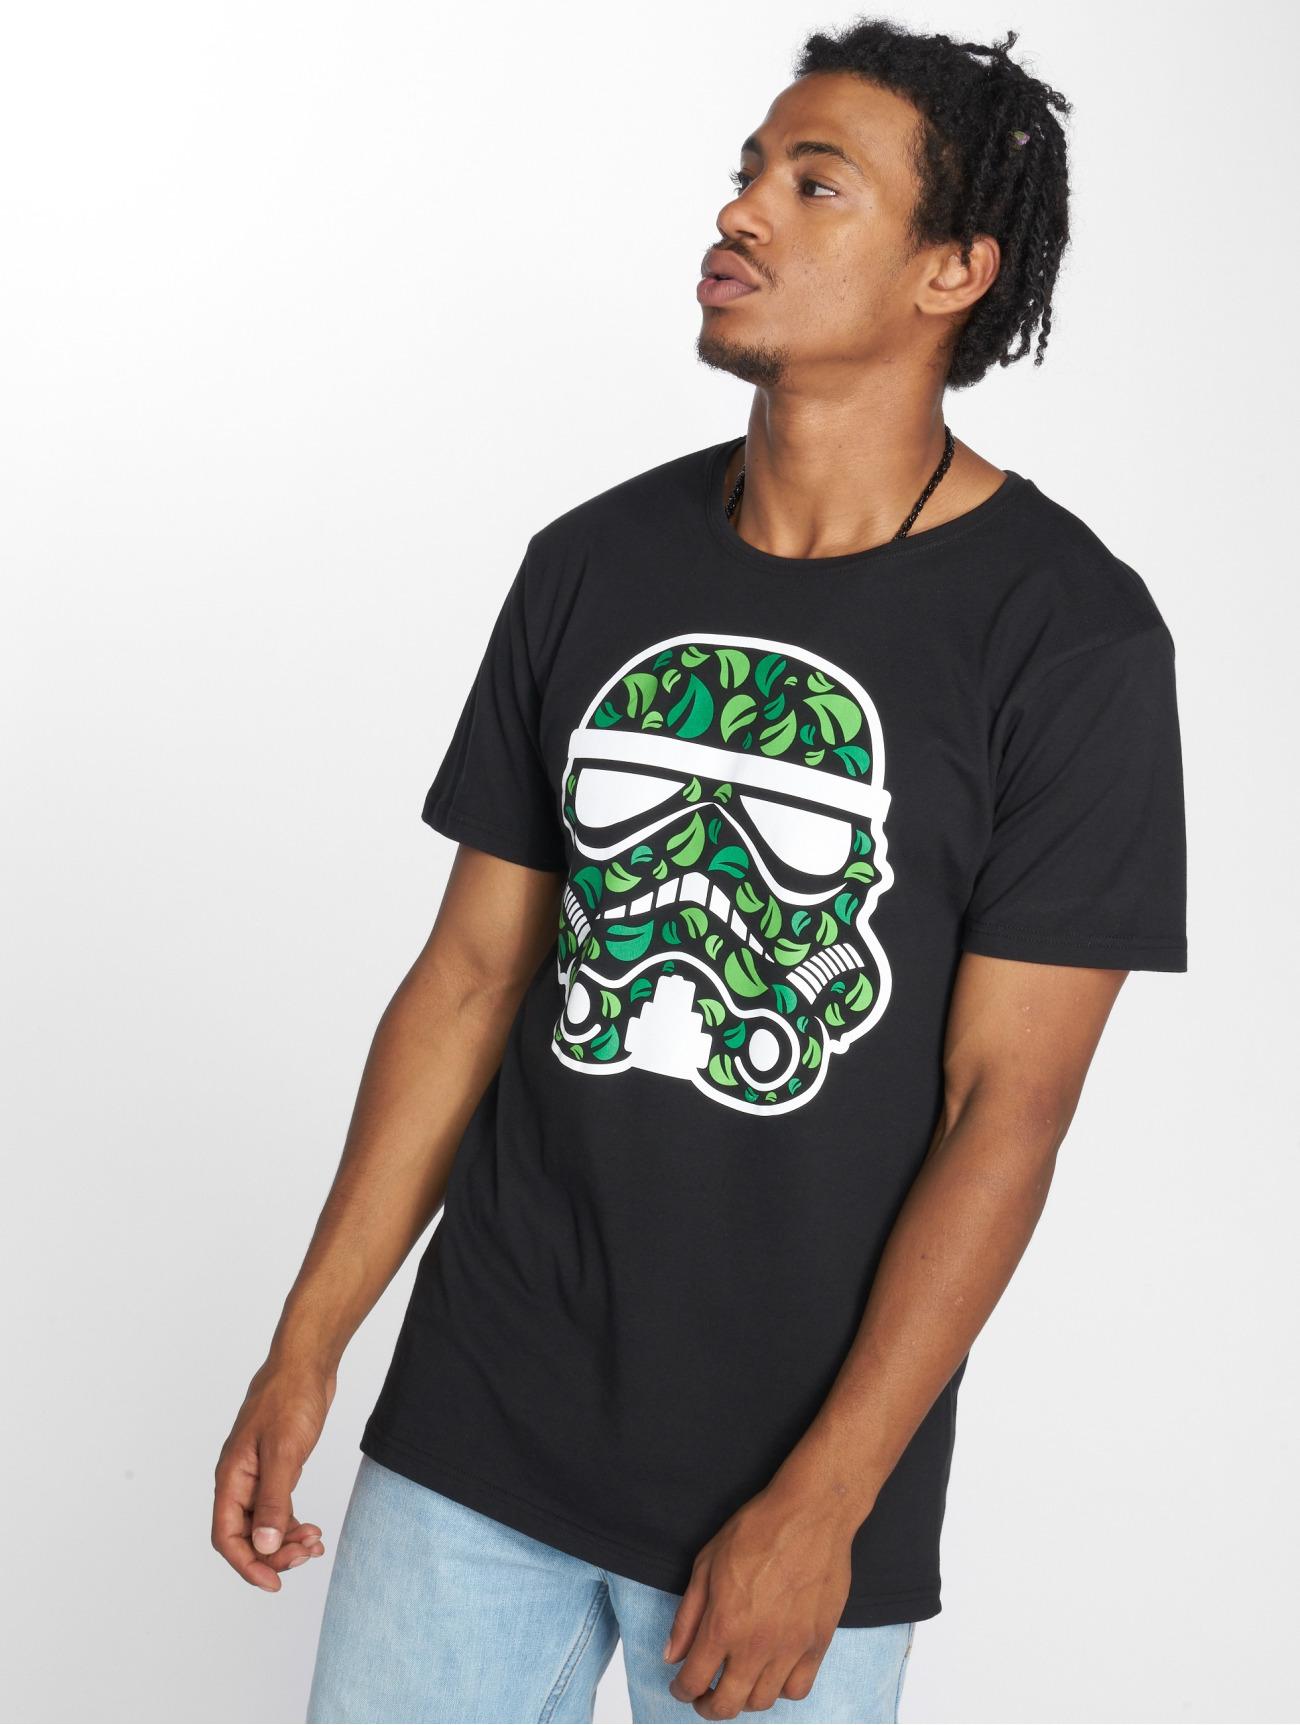 Merchcode | Stormtrooper Leaves  noir Homme T-Shirt  543181| Homme Hauts